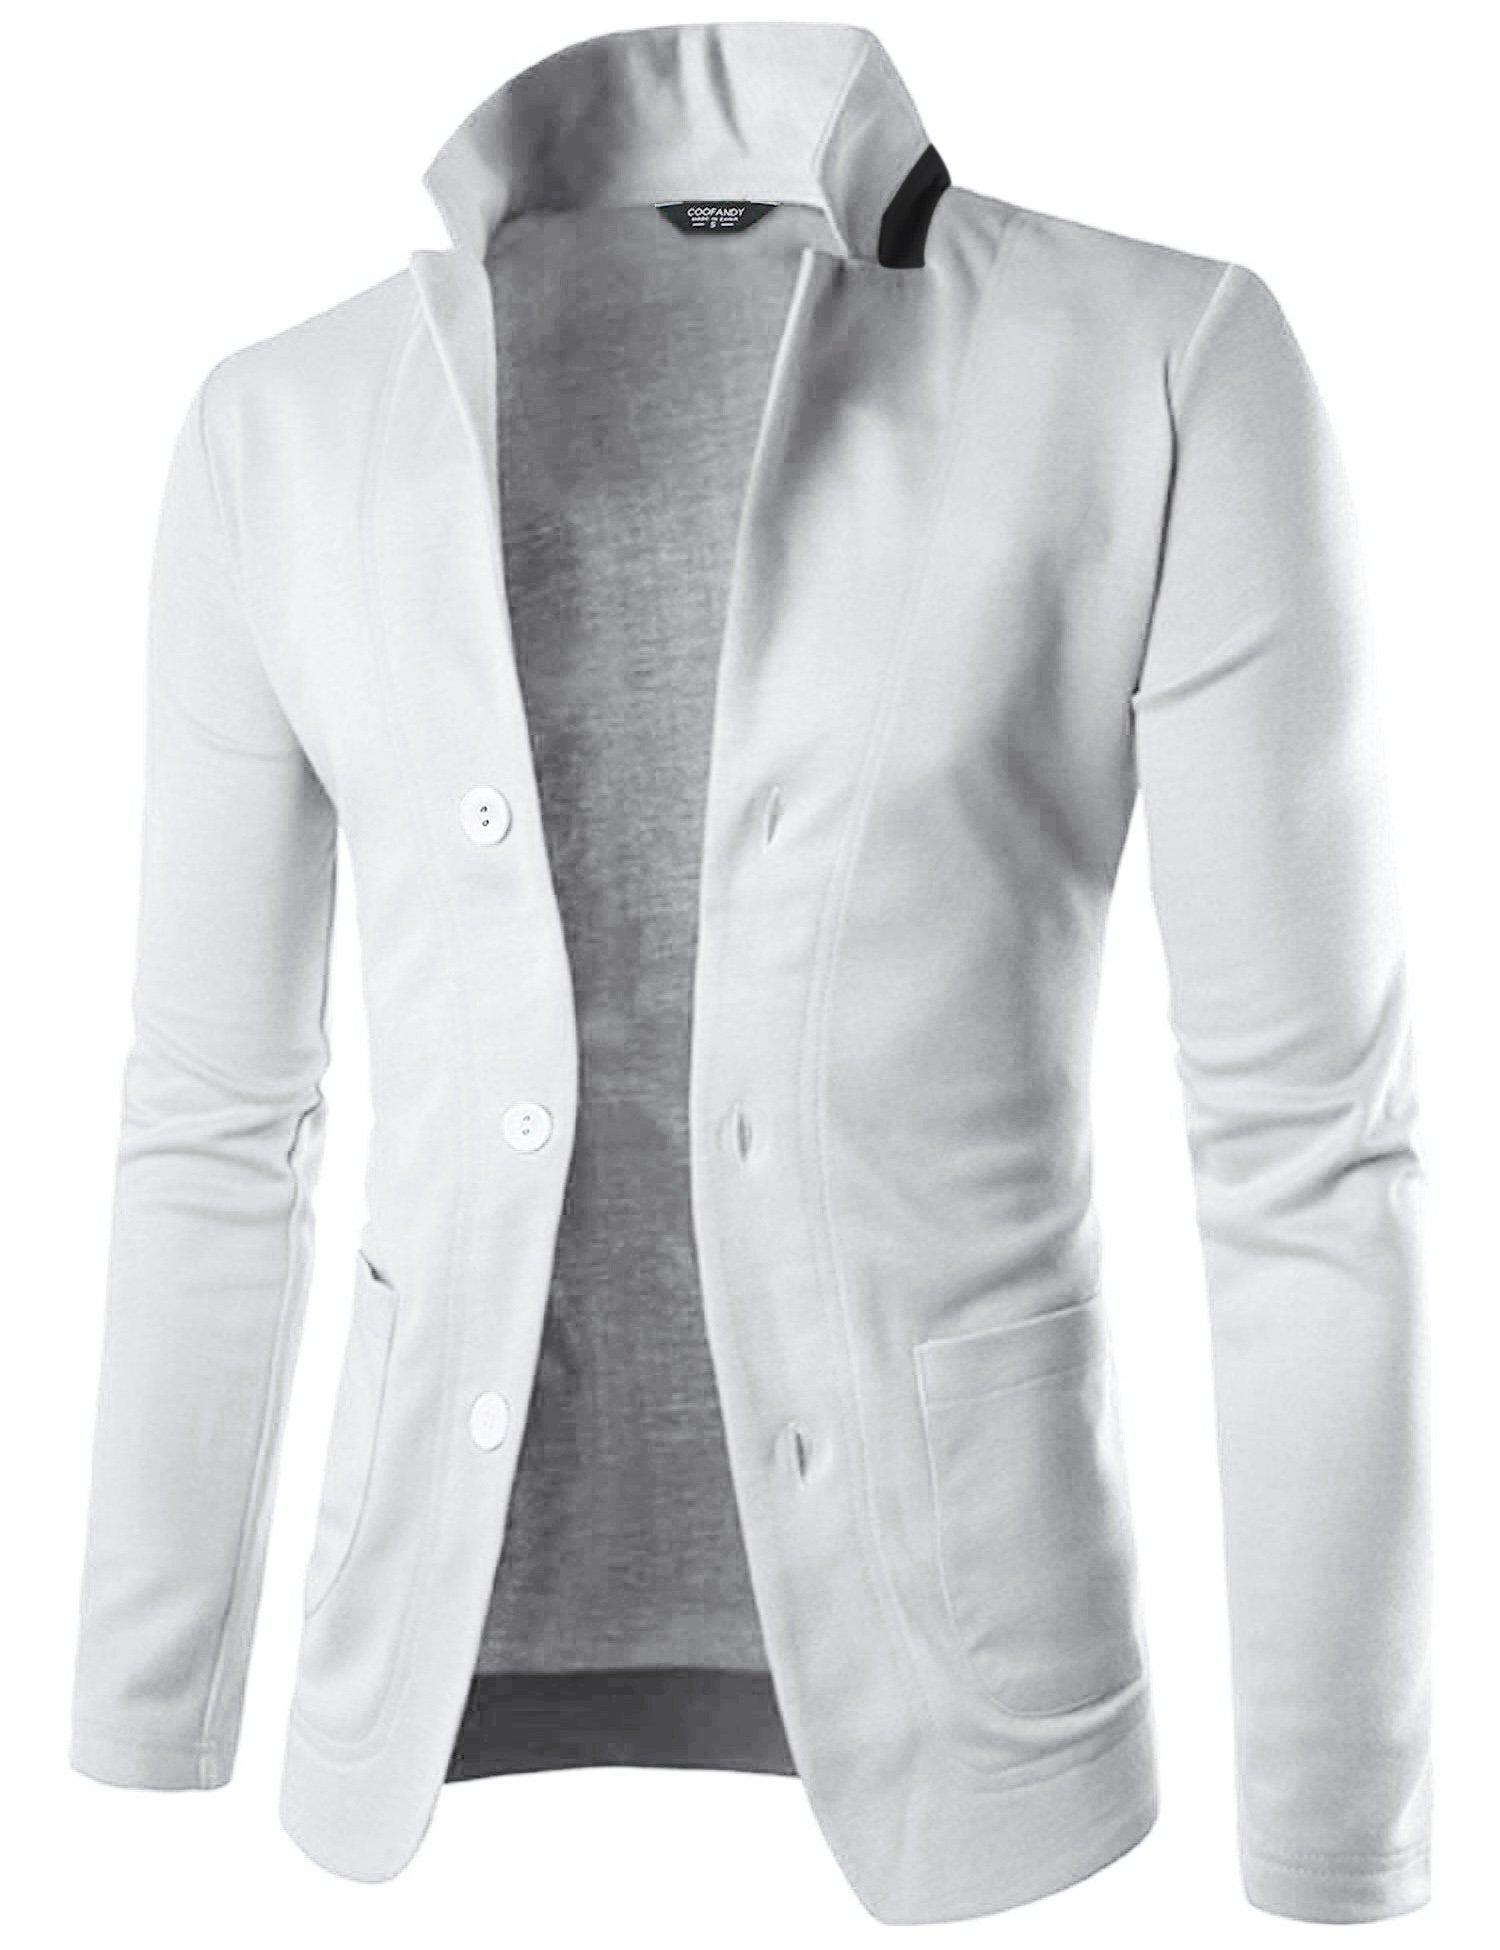 COOFANDY Mens Casual Slim Fit Blazer 3 Button Suit Sport Coat Lightweight Jacket,White,Medium by COOFANDY